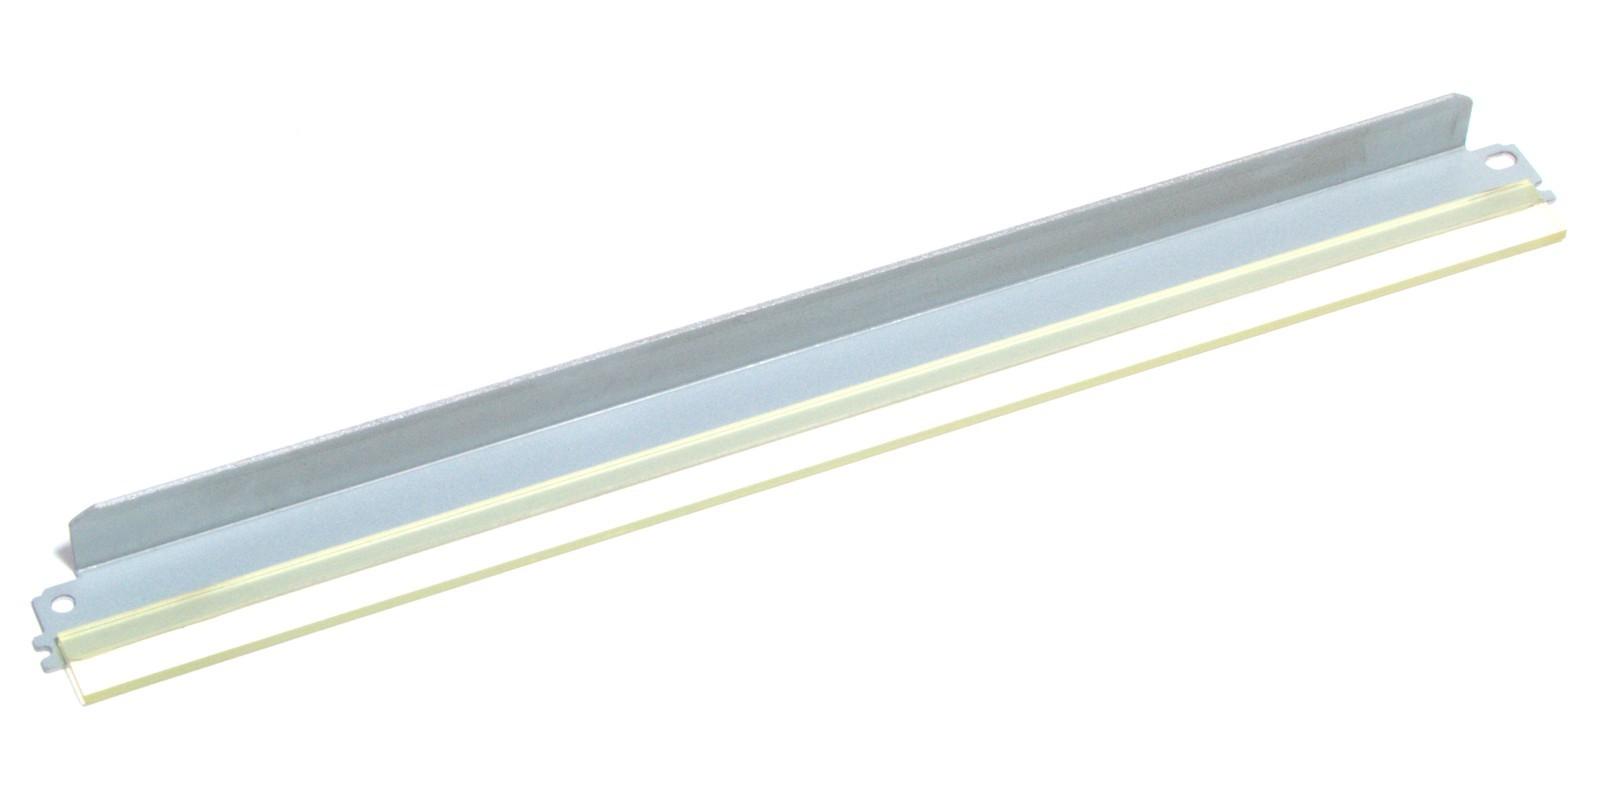 Ракель MAK© WB 3220 (106R01485/106R01487) Wiper Blade - чистящее лезвие.